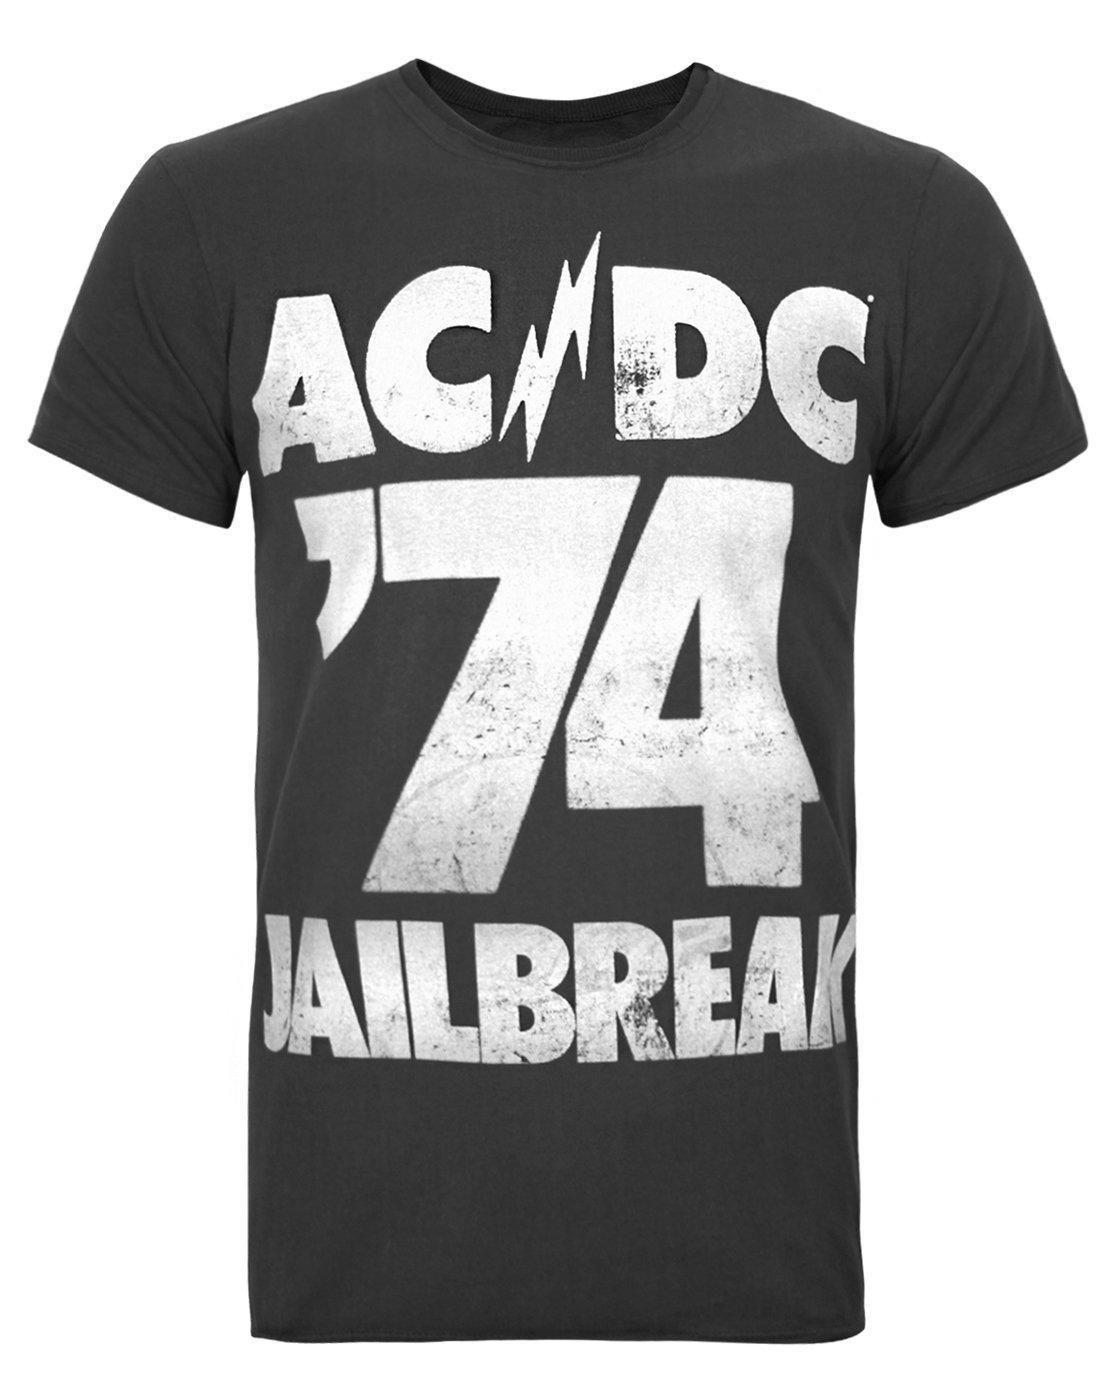 8f5f546cc28f Amplified AC DC Jailbreak Men S T Shirt Wholesale Short Sleeve Fashion  Summer New Brand Clothing Personality 2018 Brand T Shirt Shop Design Crazy T  Shirts ...